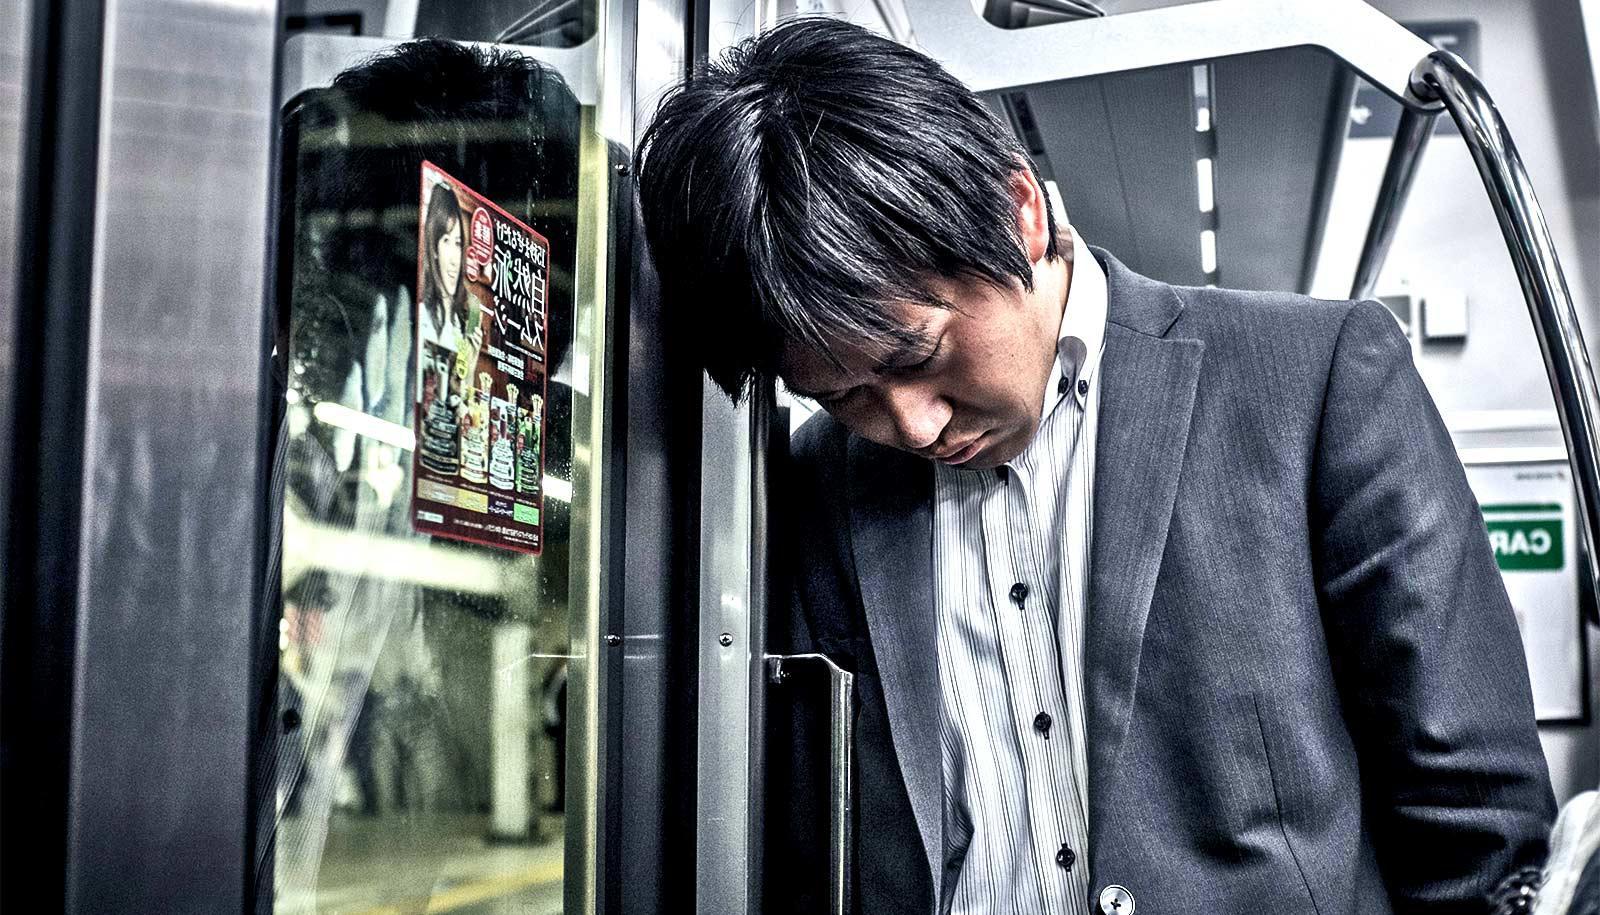 asleep standing on the train